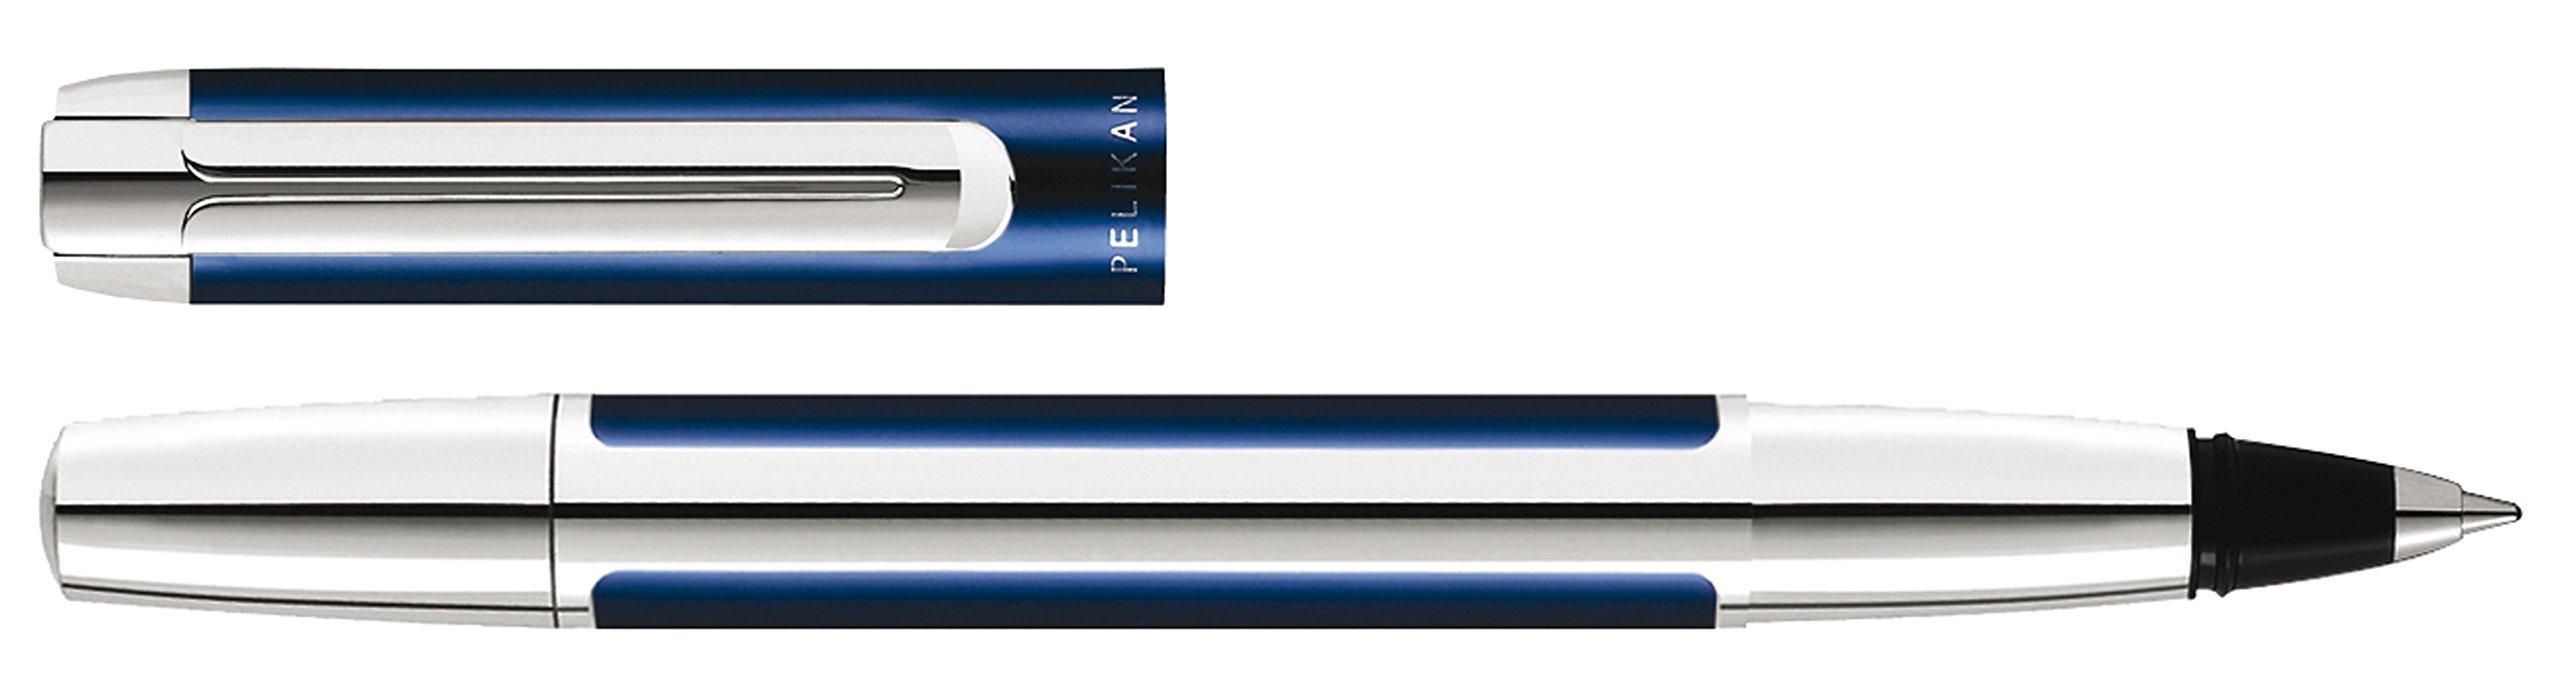 Pelikan R40 Pura 954941 Rollerball Blue Silver by Pelikan (Image #1)